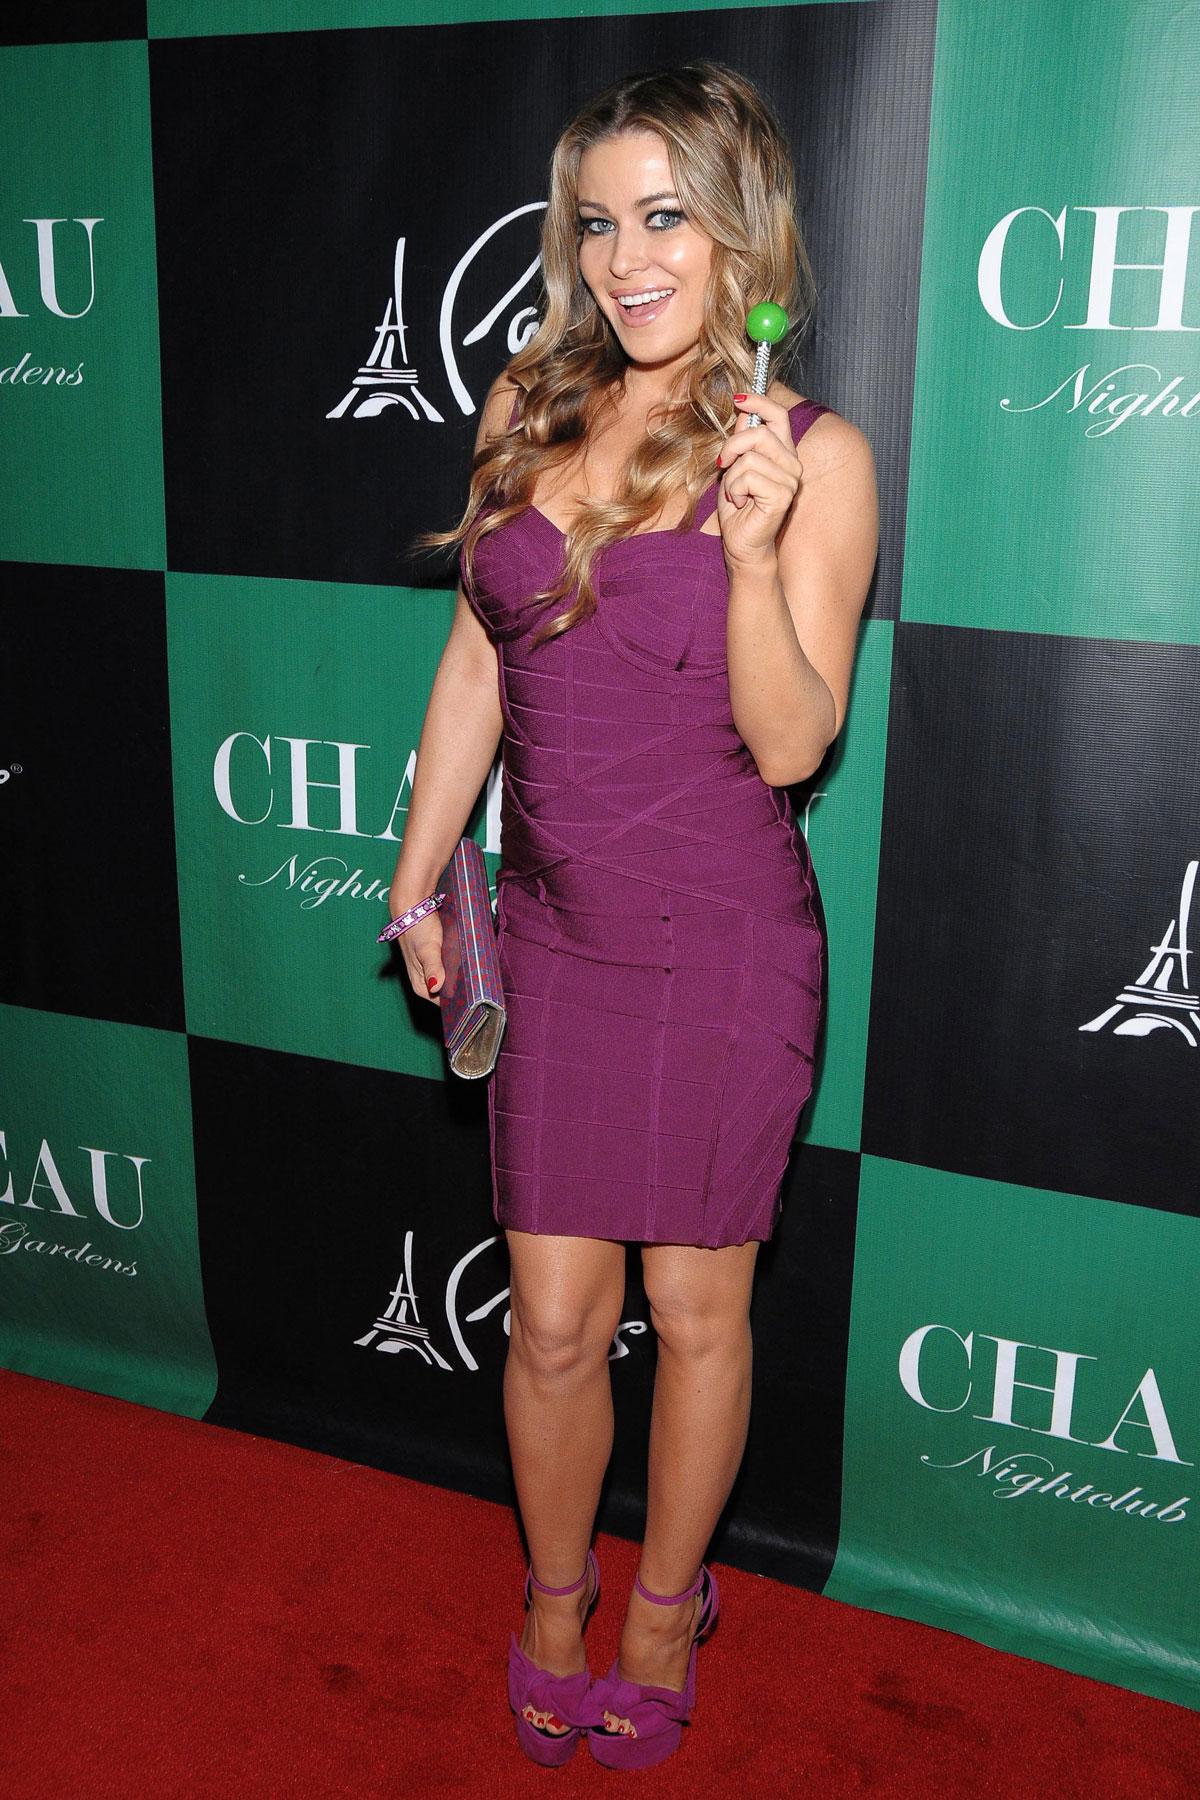 Abc Las Vegas >> CARMEN ELECTRA at Chateau Nightclub and Gardens in Las Vegas - HawtCelebs